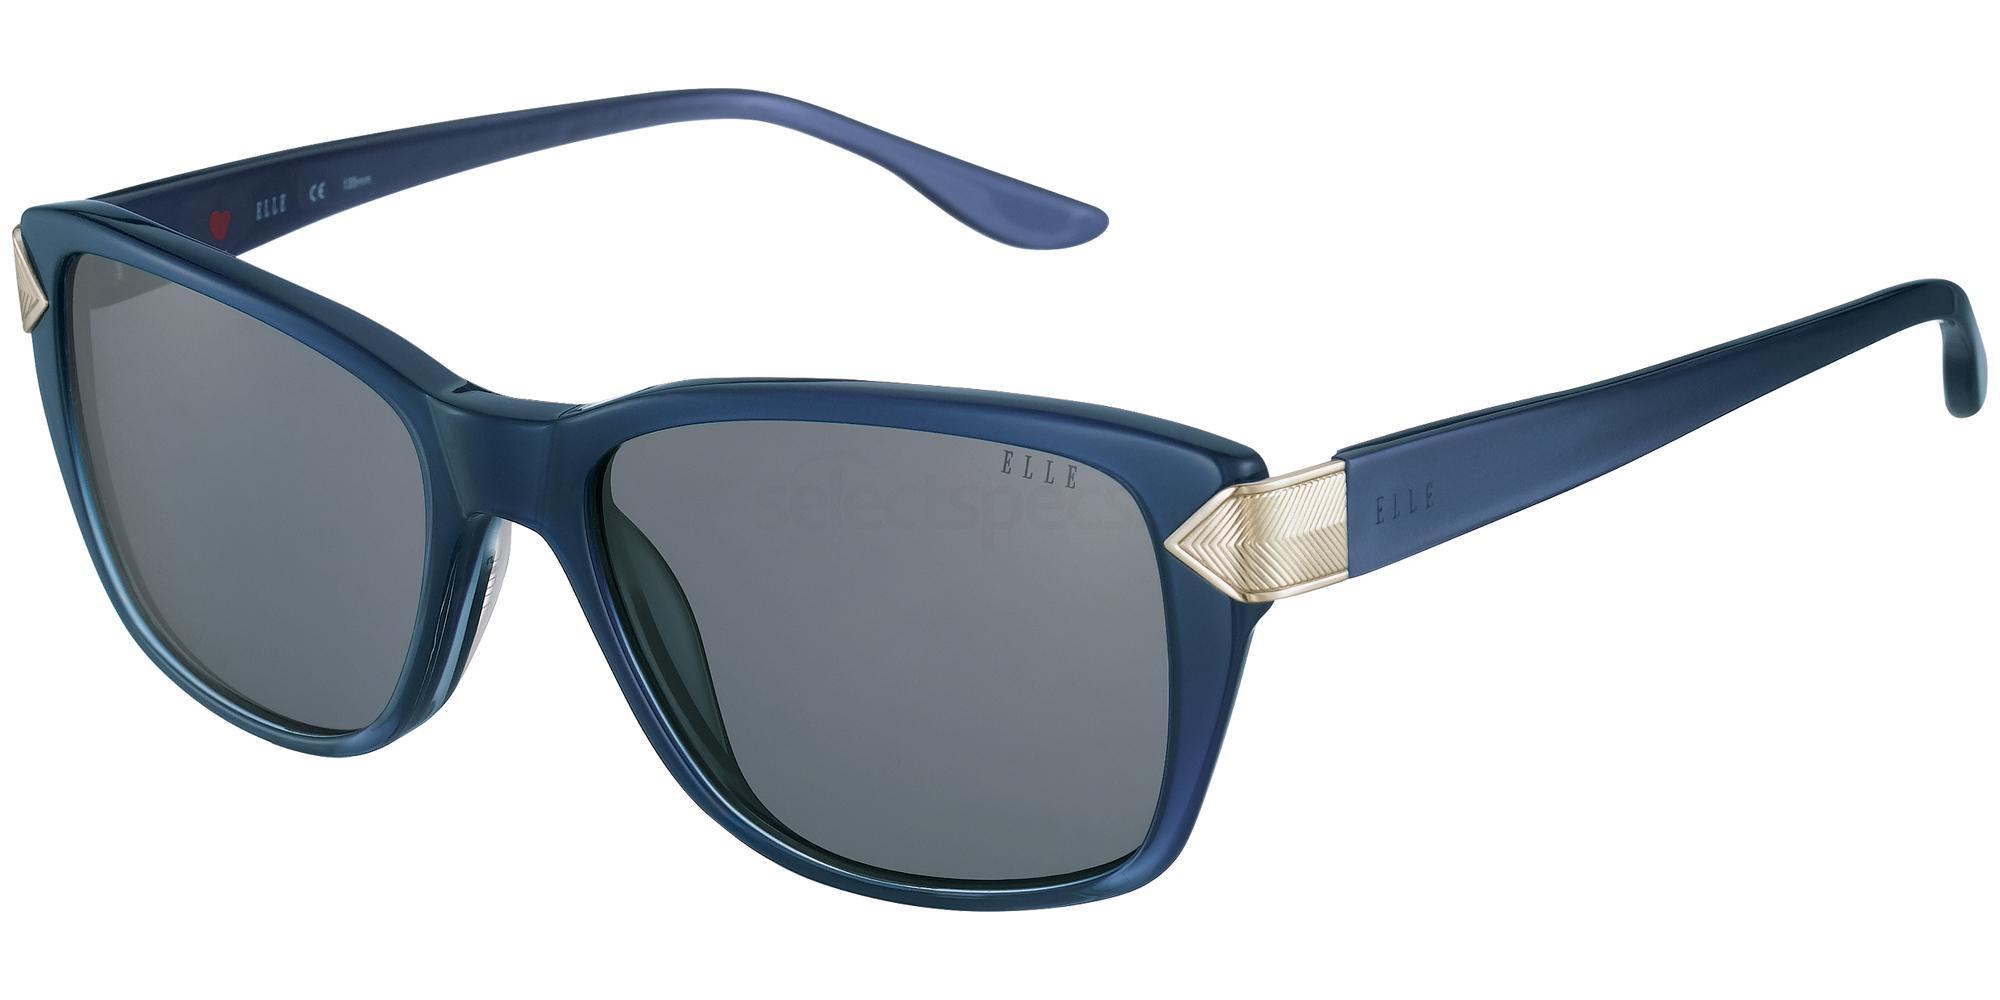 GR EL14829 Sunglasses, ELLE